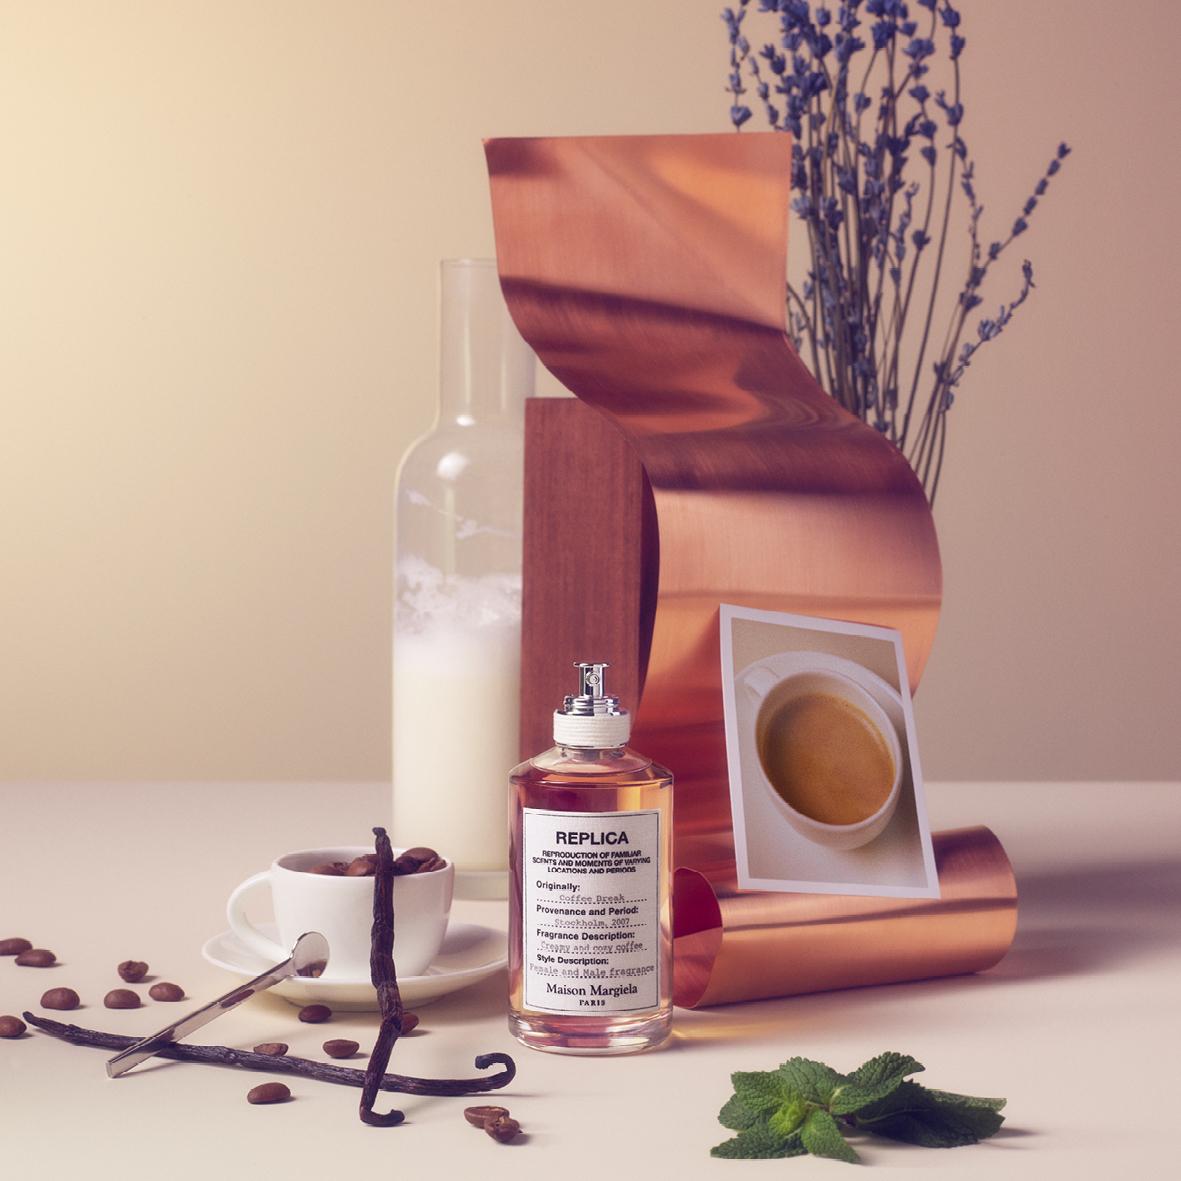 REPLICA Coffee Break product media